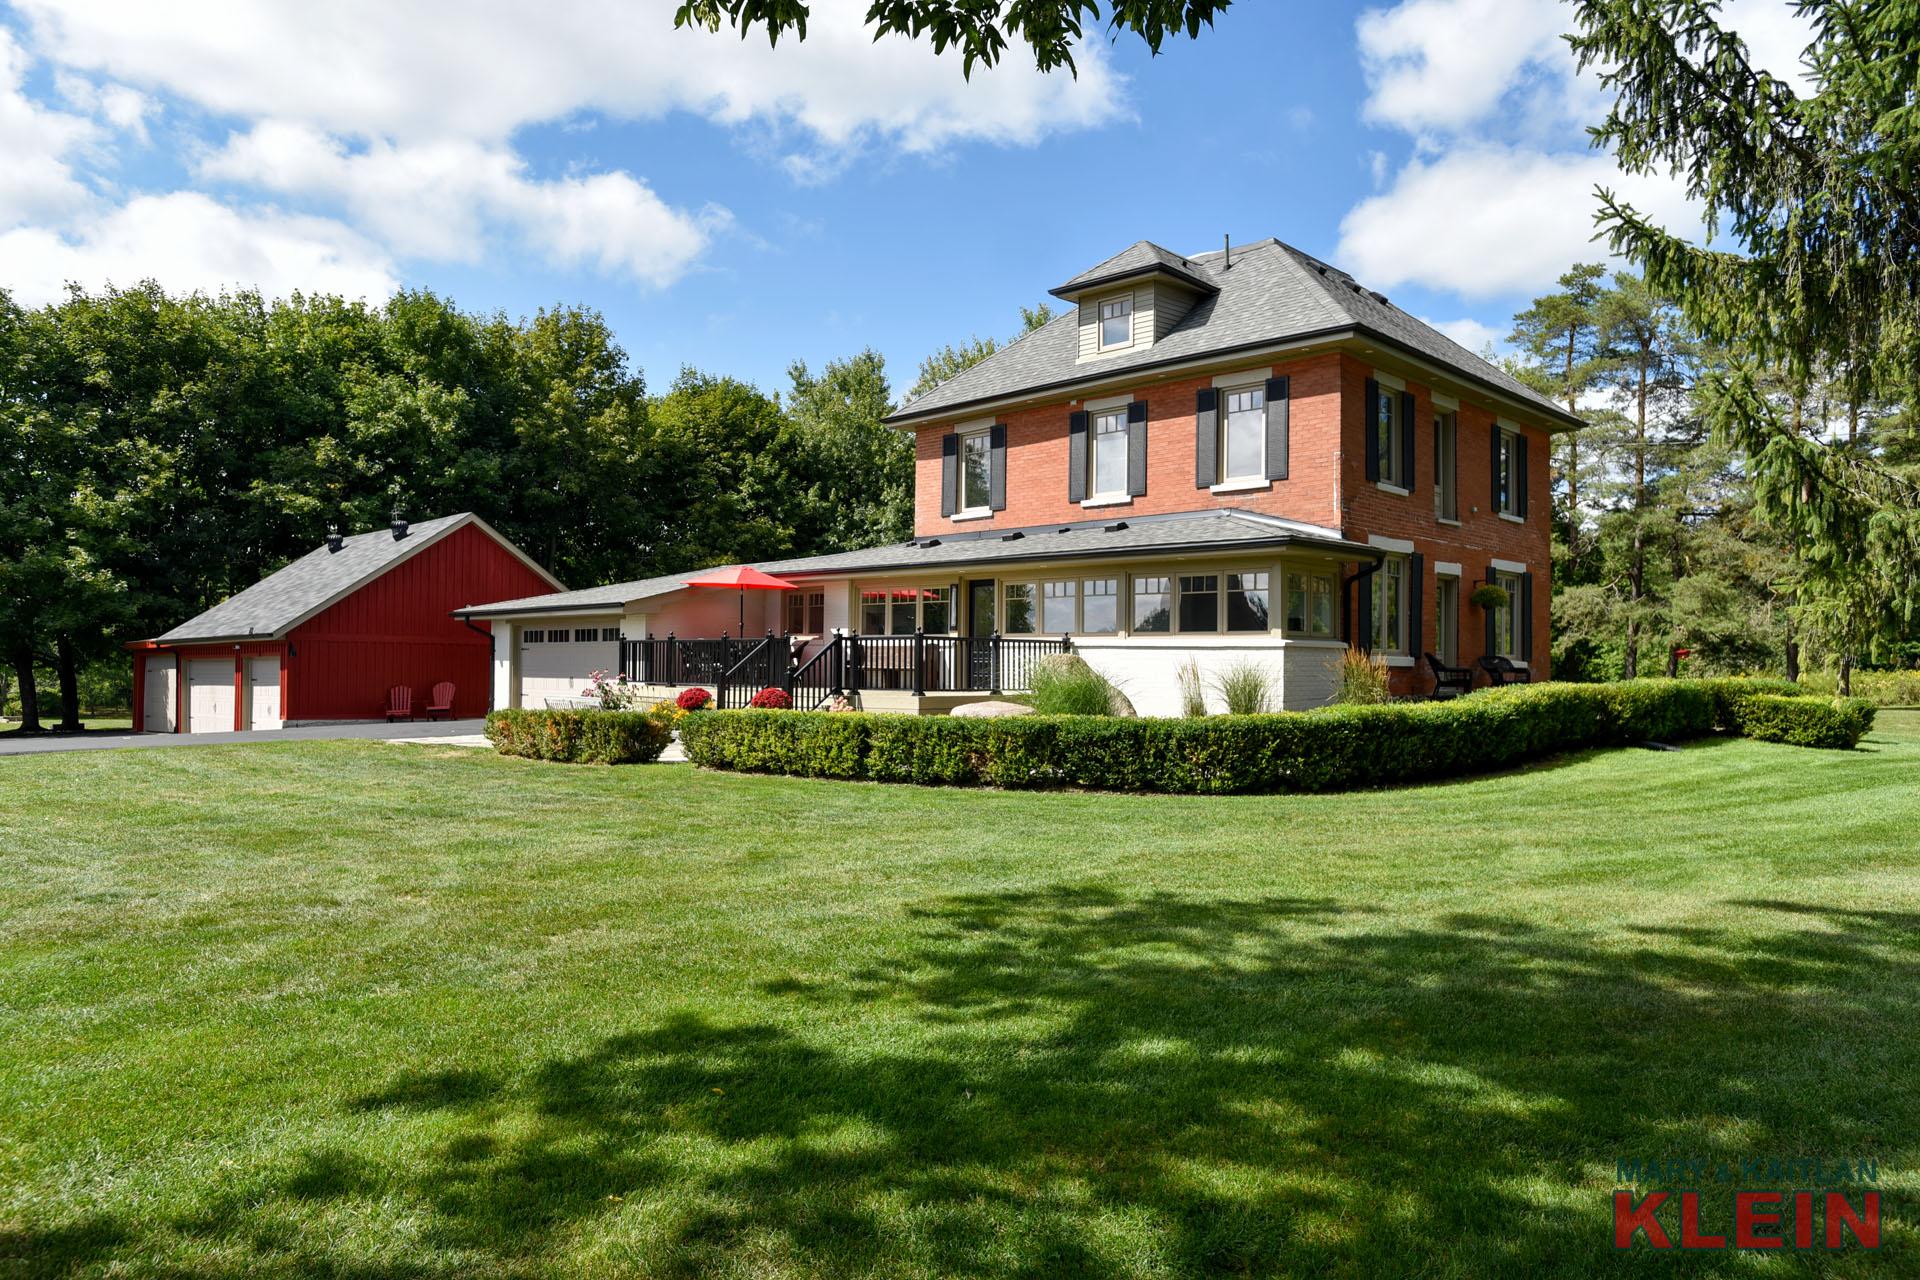 17552 Horseshoe Hill Road, Caledon Escarpment, 30 Acres for Sale, Klein